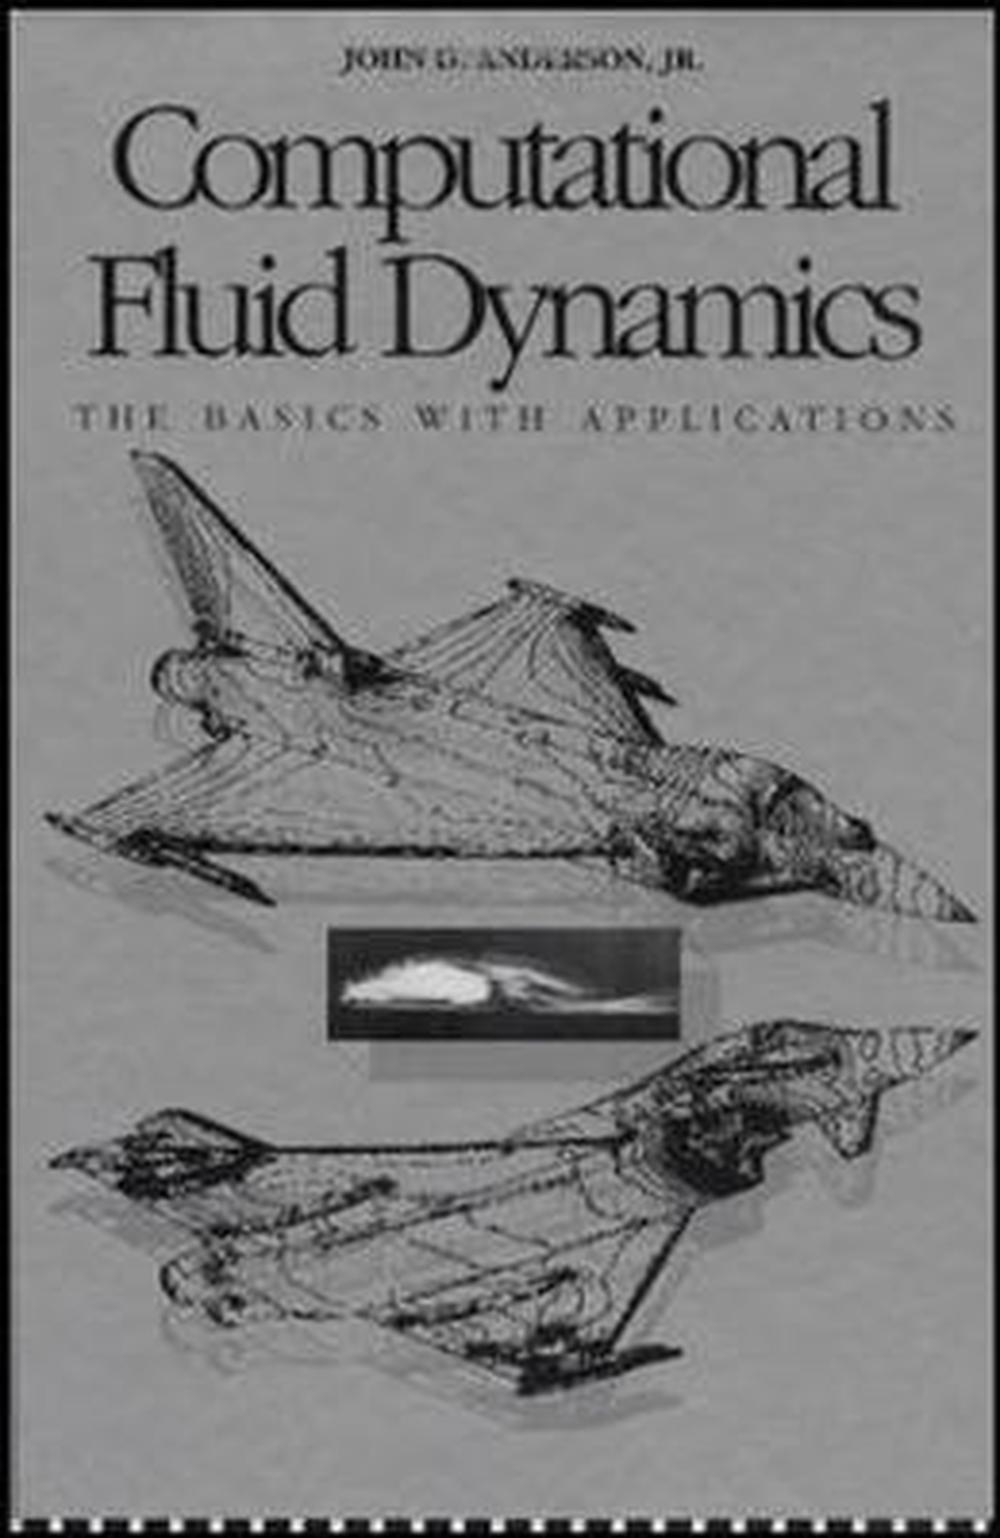 Computational Fluid Dynamics by John Anderson, Hardcover